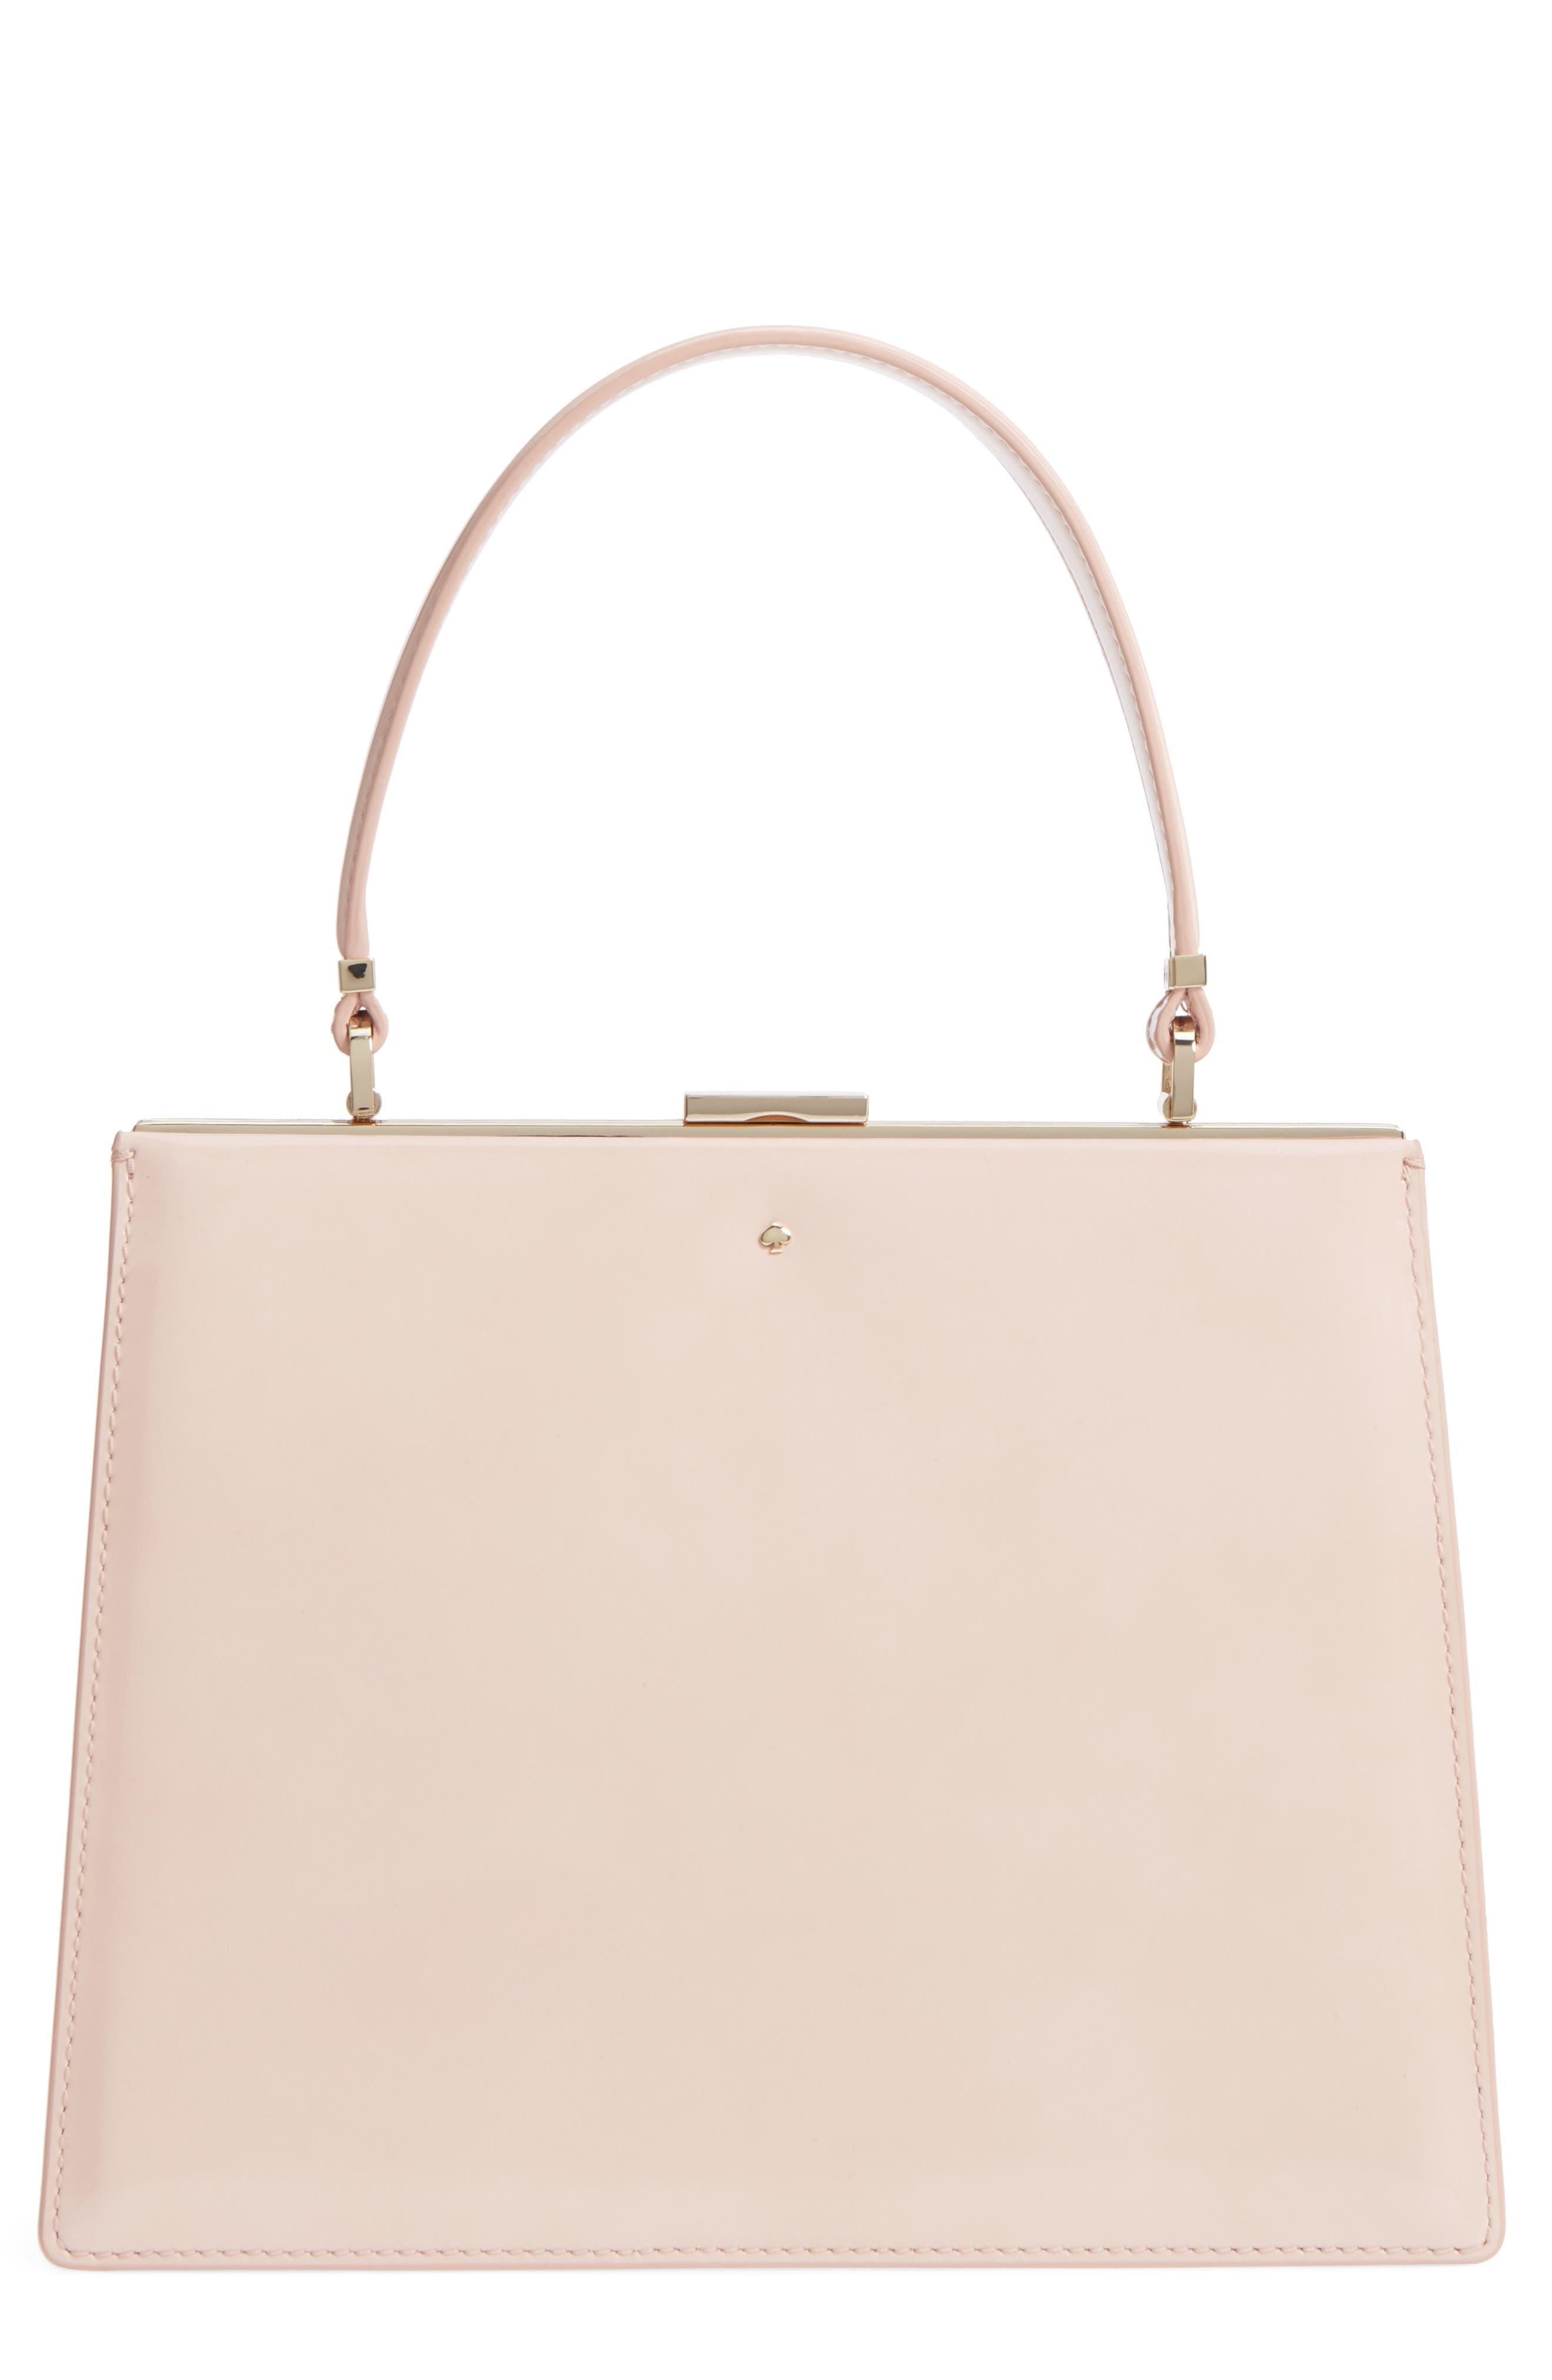 madison moore road - chari leather handbag,                             Main thumbnail 1, color,                             Sand Flat